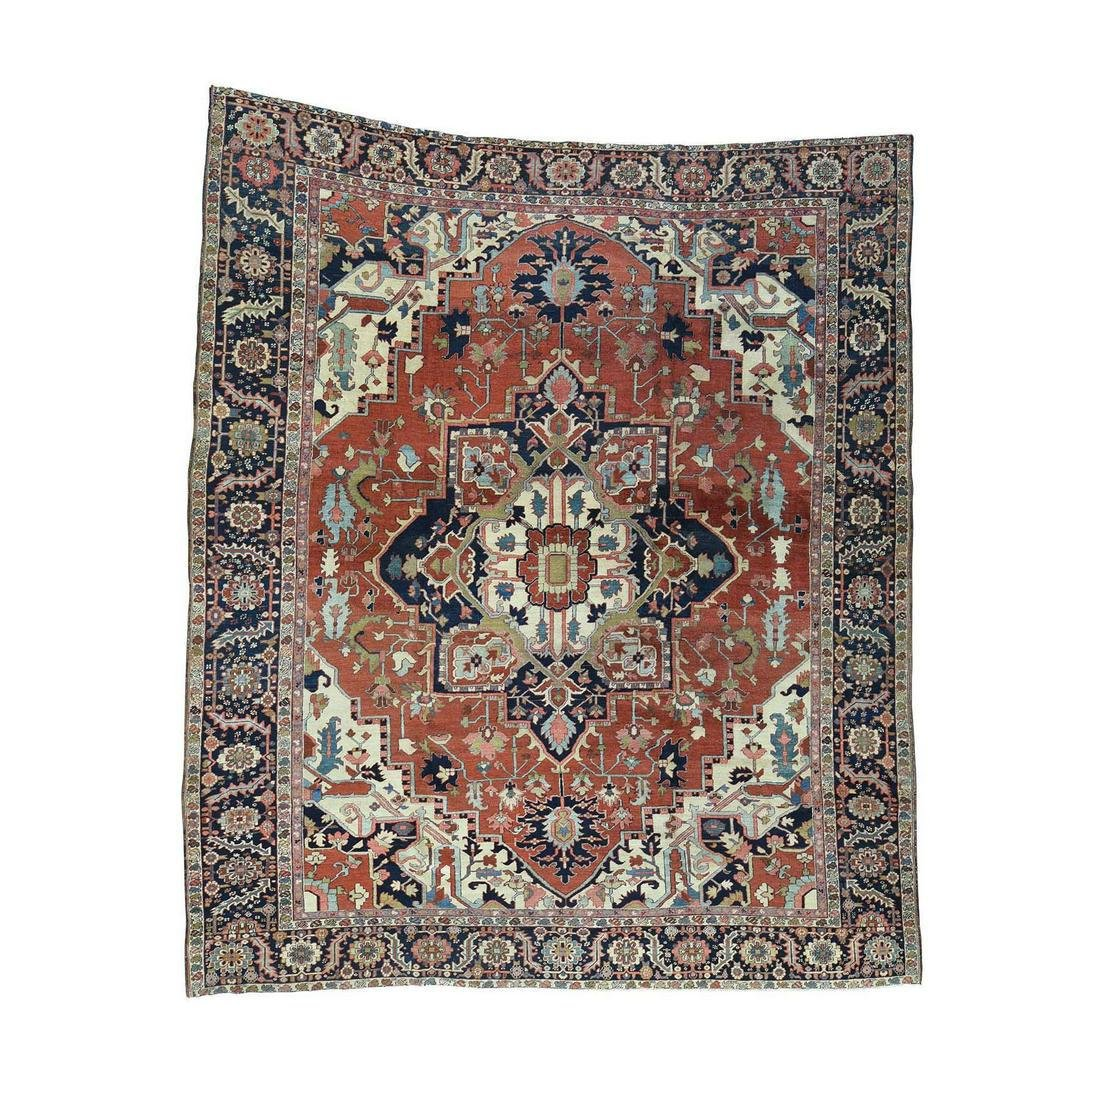 Hand-Knotted Antique Persian Serapi Squarish Good Cond